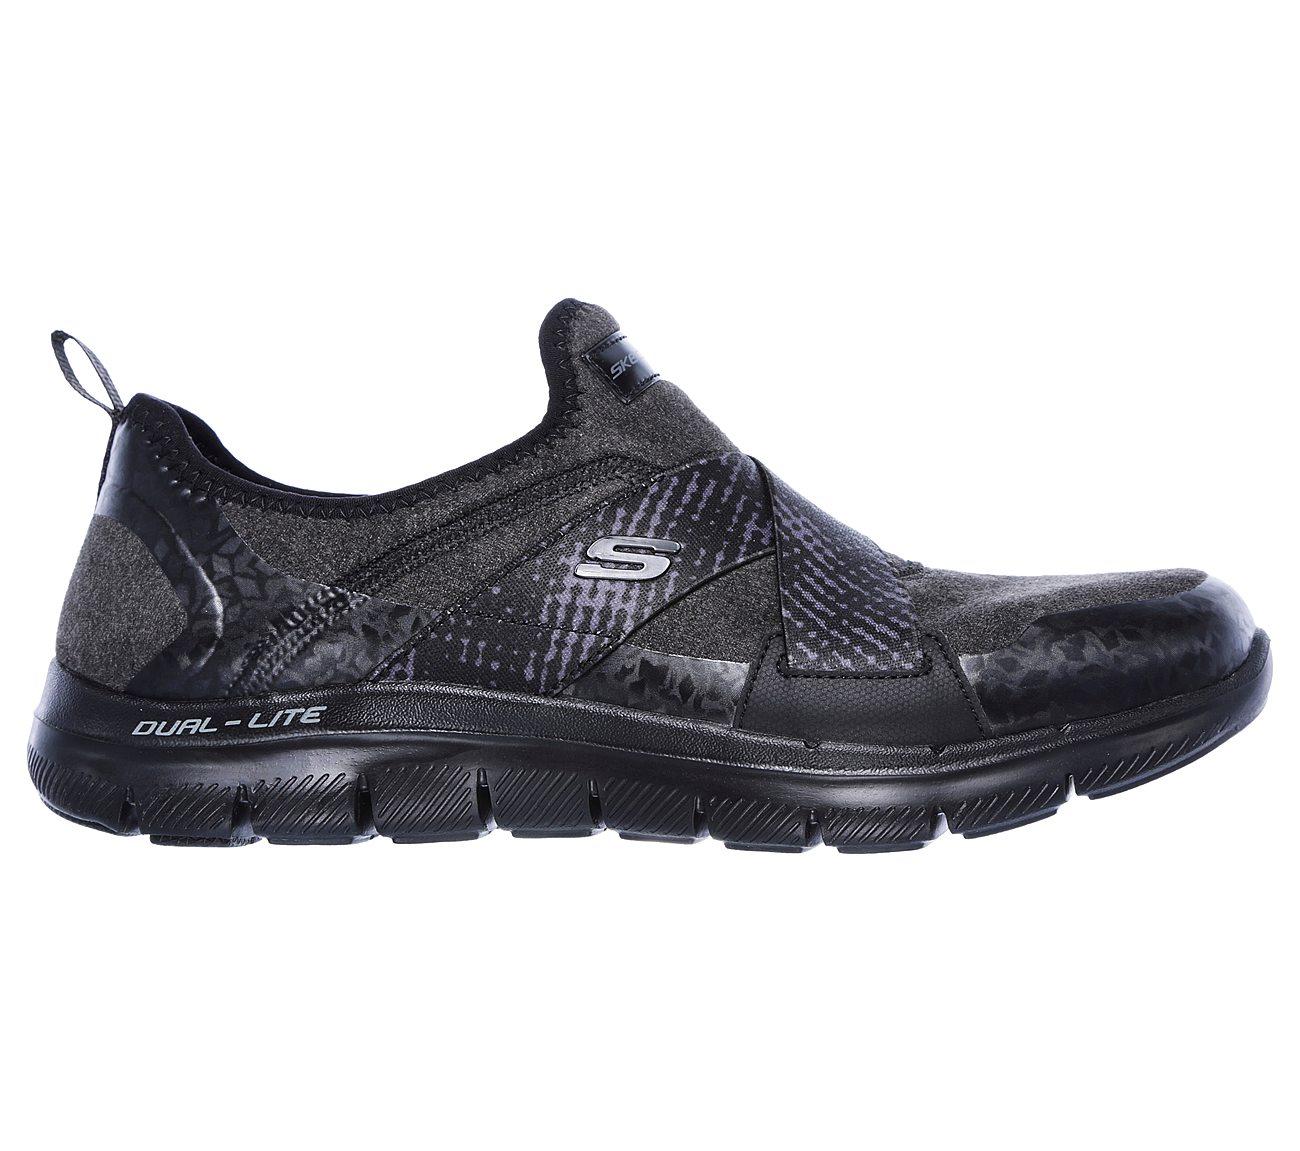 Zapatos 2018 moda caliente cómo llegar Buy SKECHERS Flex Appeal 2.0 - Bright Eyed Flex Appeal Shoes